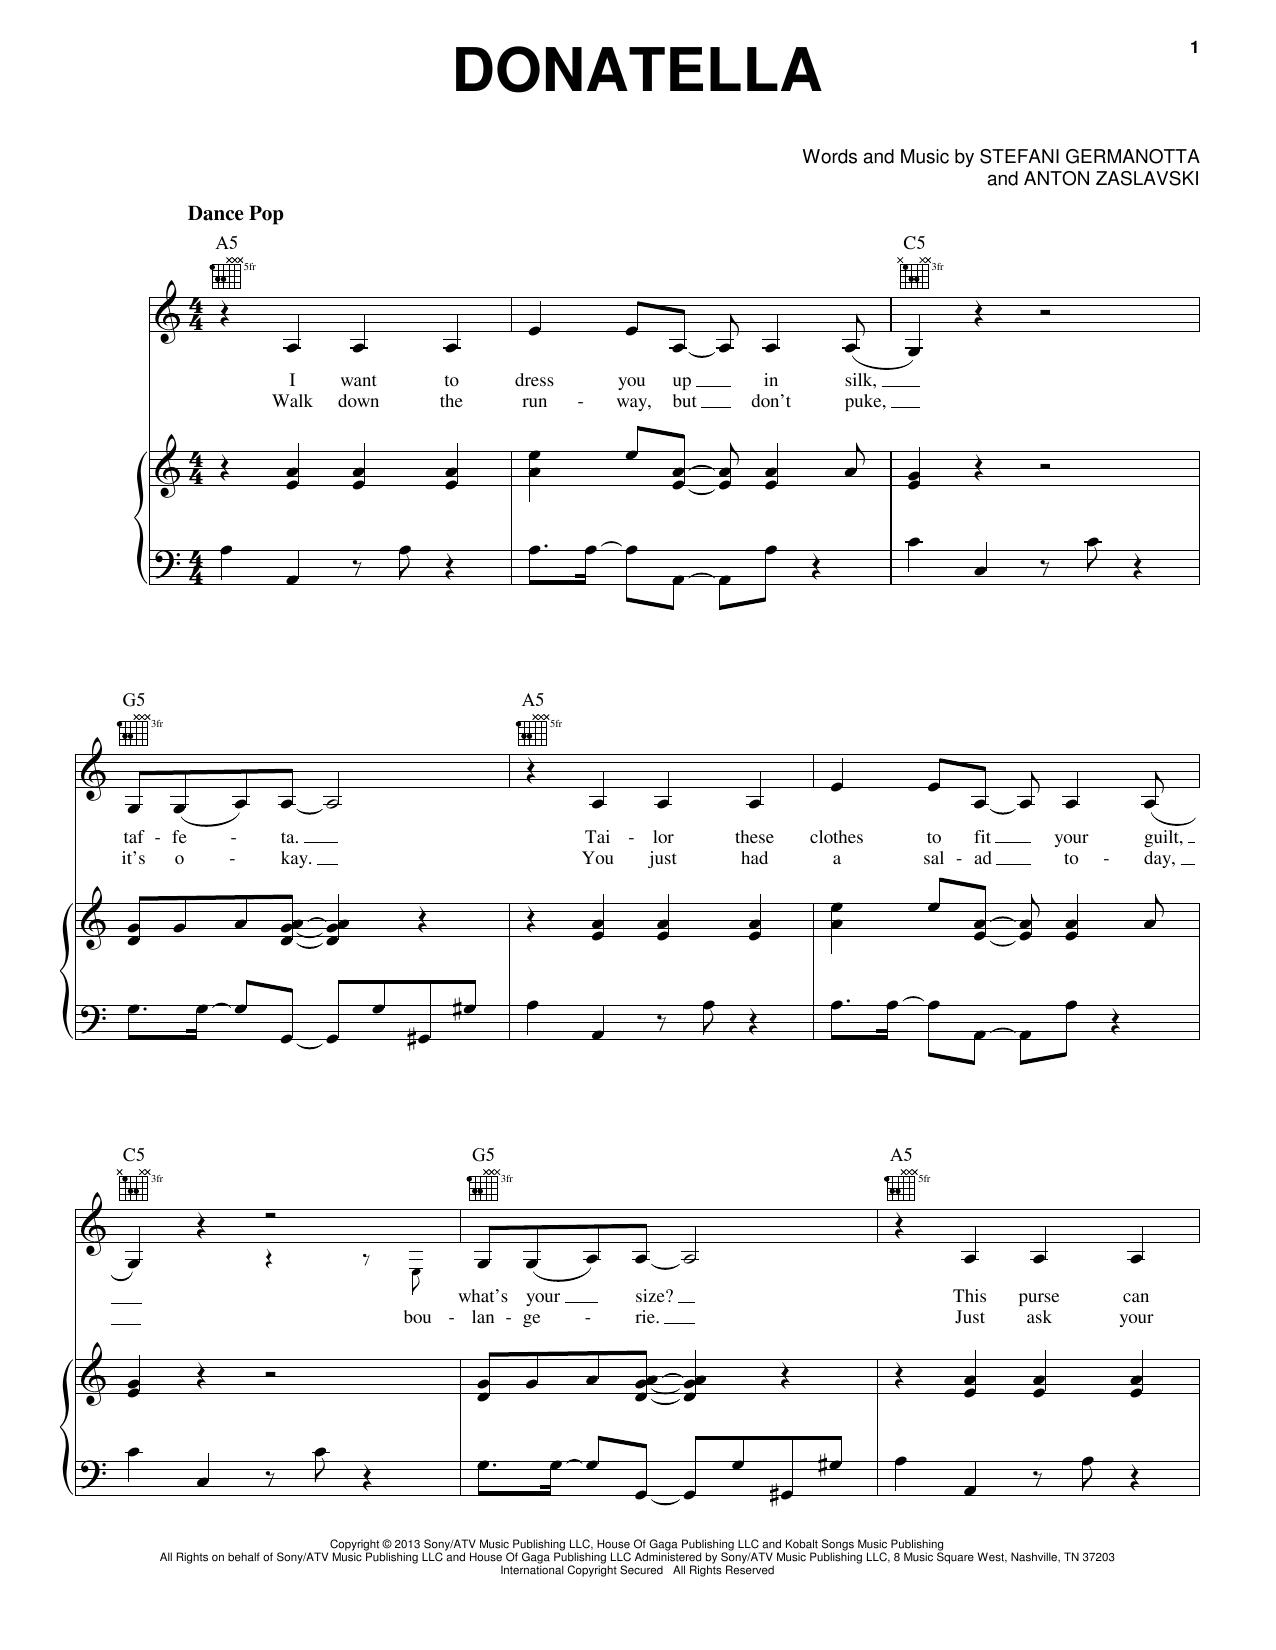 Lady Gaga Donatella sheet music notes and chords. Download Printable PDF.